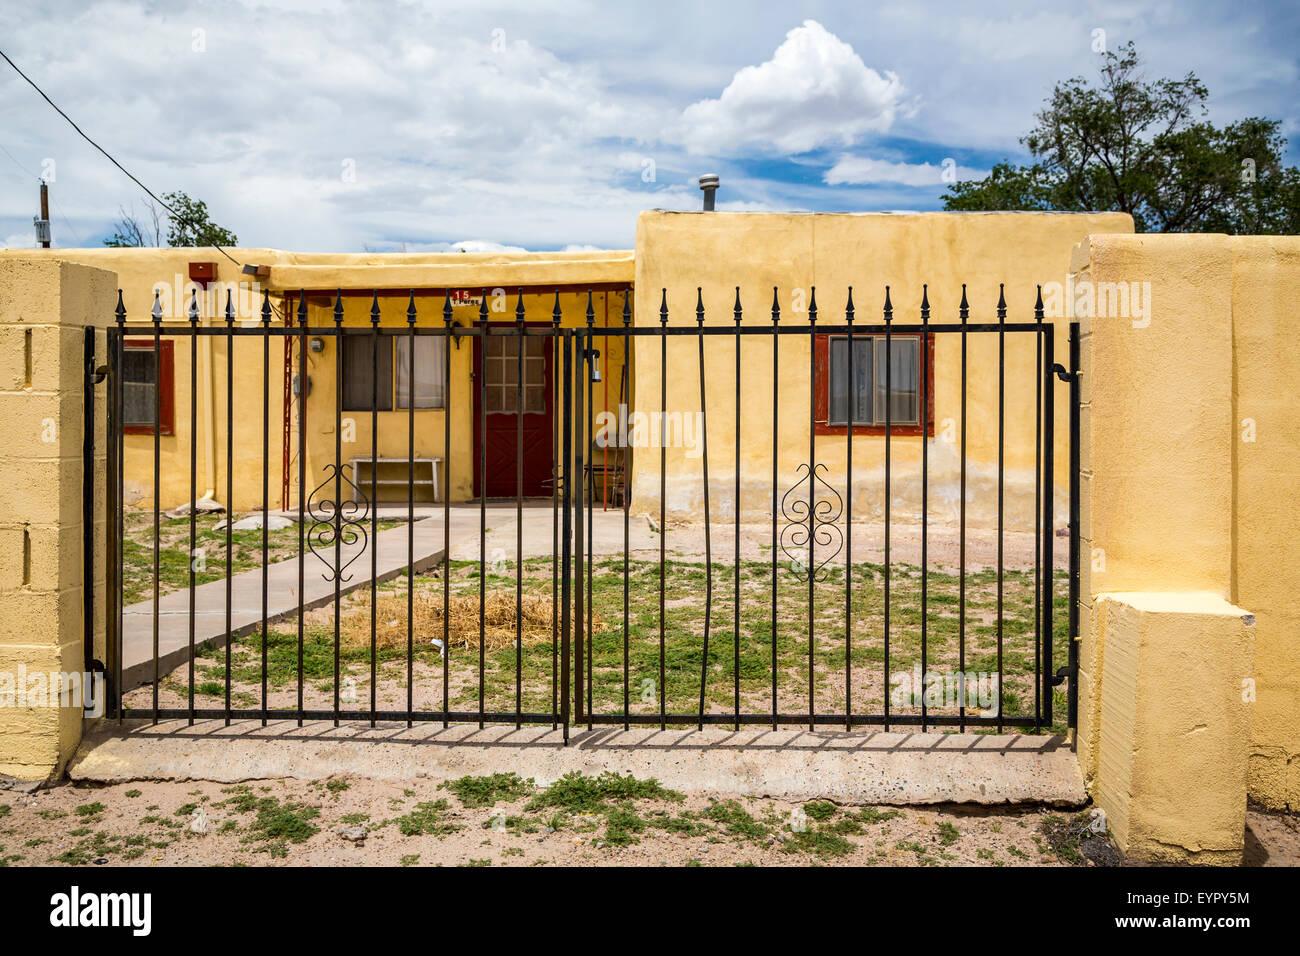 A village home in the Pueblo of Isleta, New Mexico, USA. Stock Photo